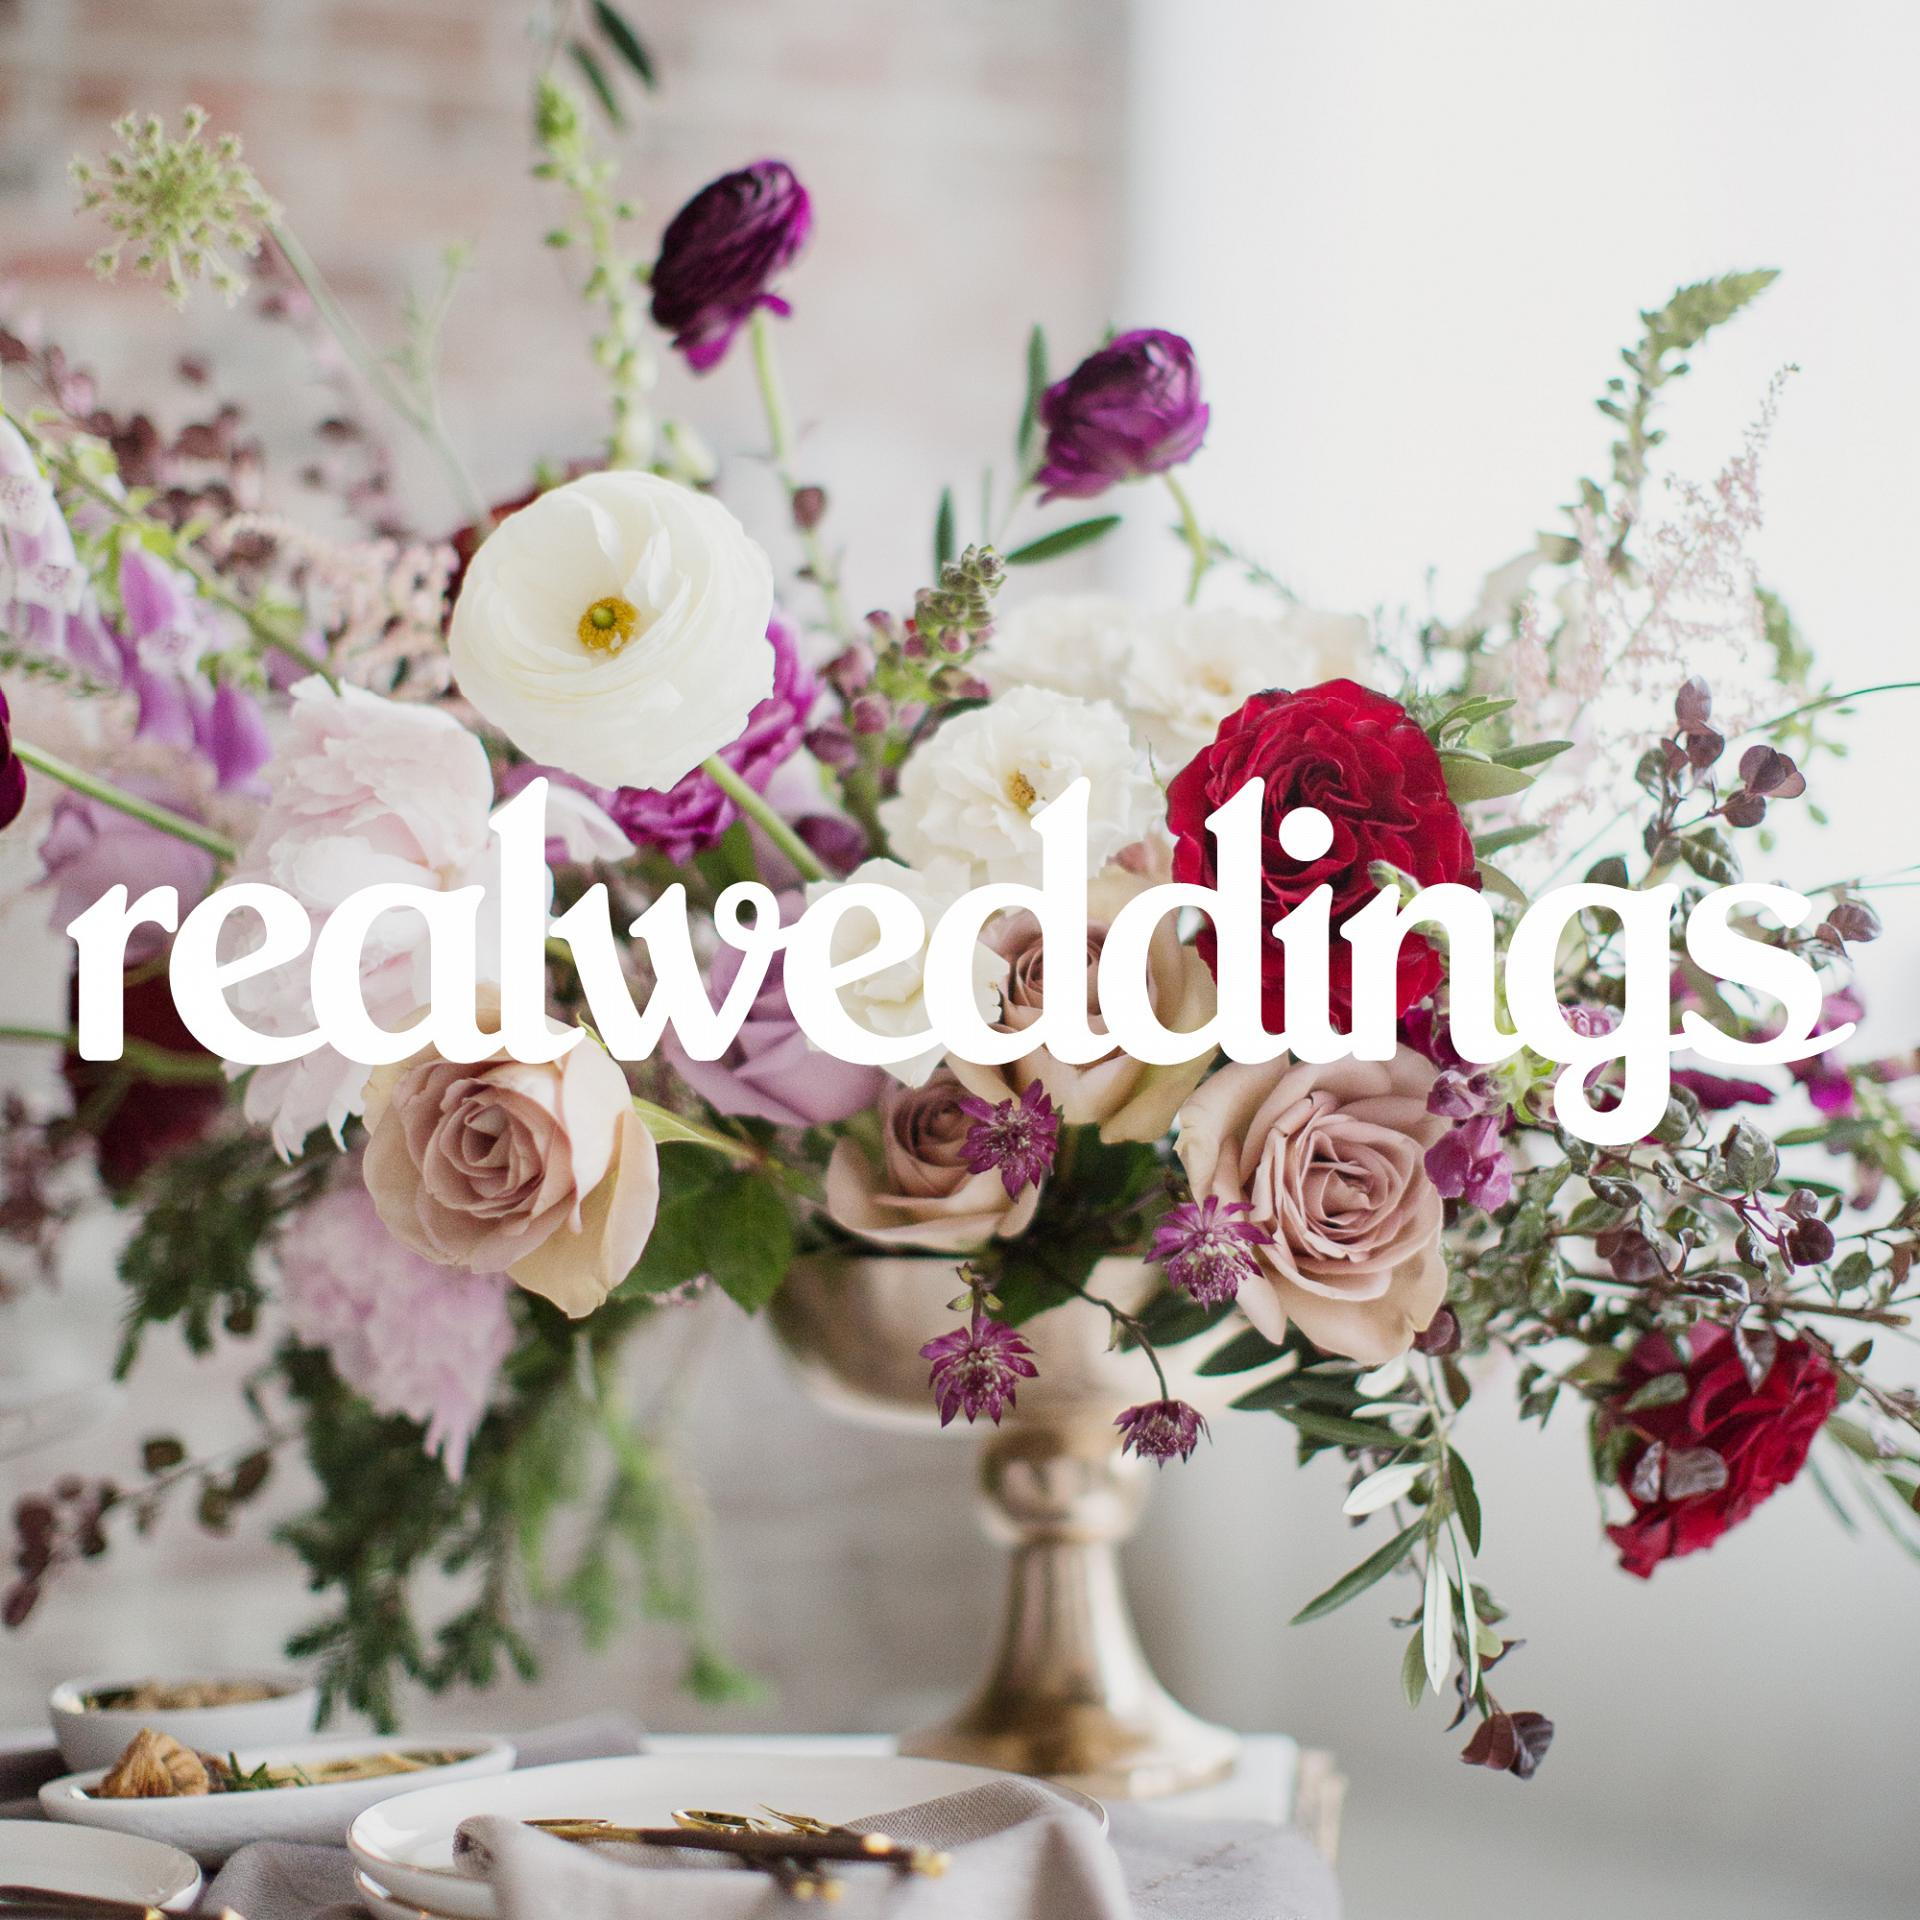 realweddings.jpg